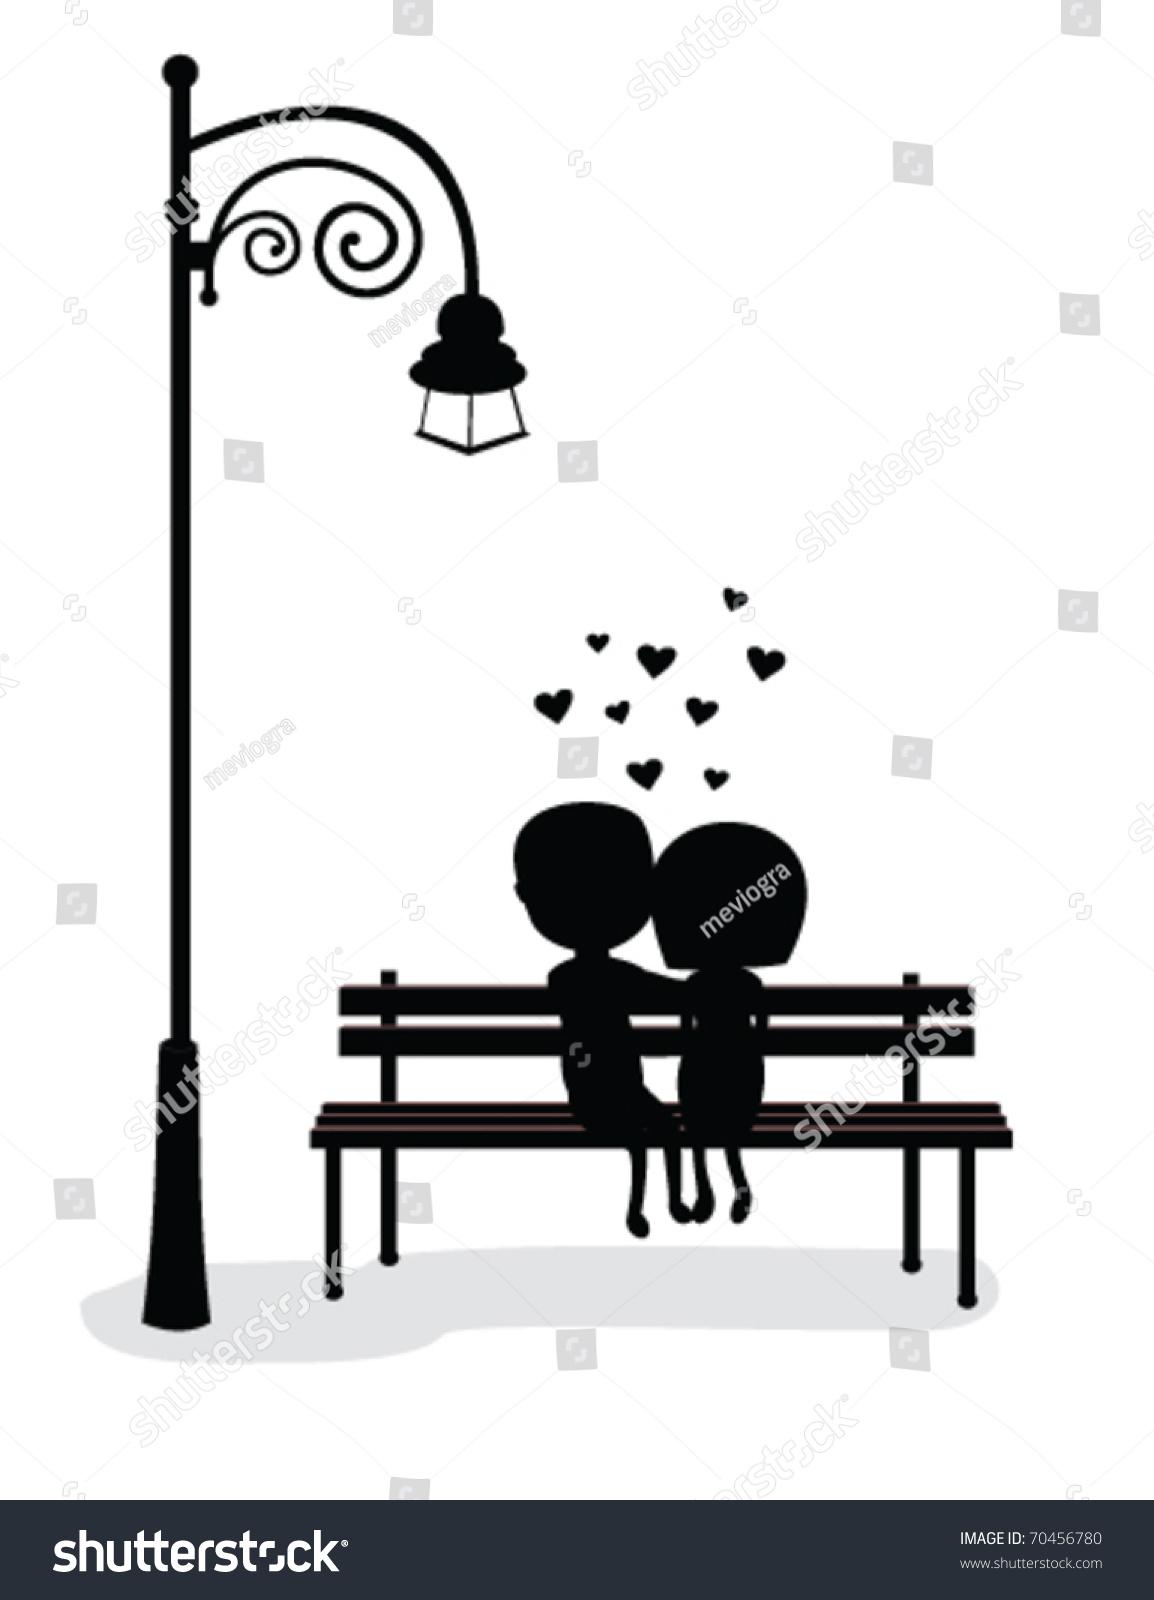 Silhouette Boy Girl Sitting On Bench Stock Vector 70456780 ... for Bench Silhouette Side  35fsj